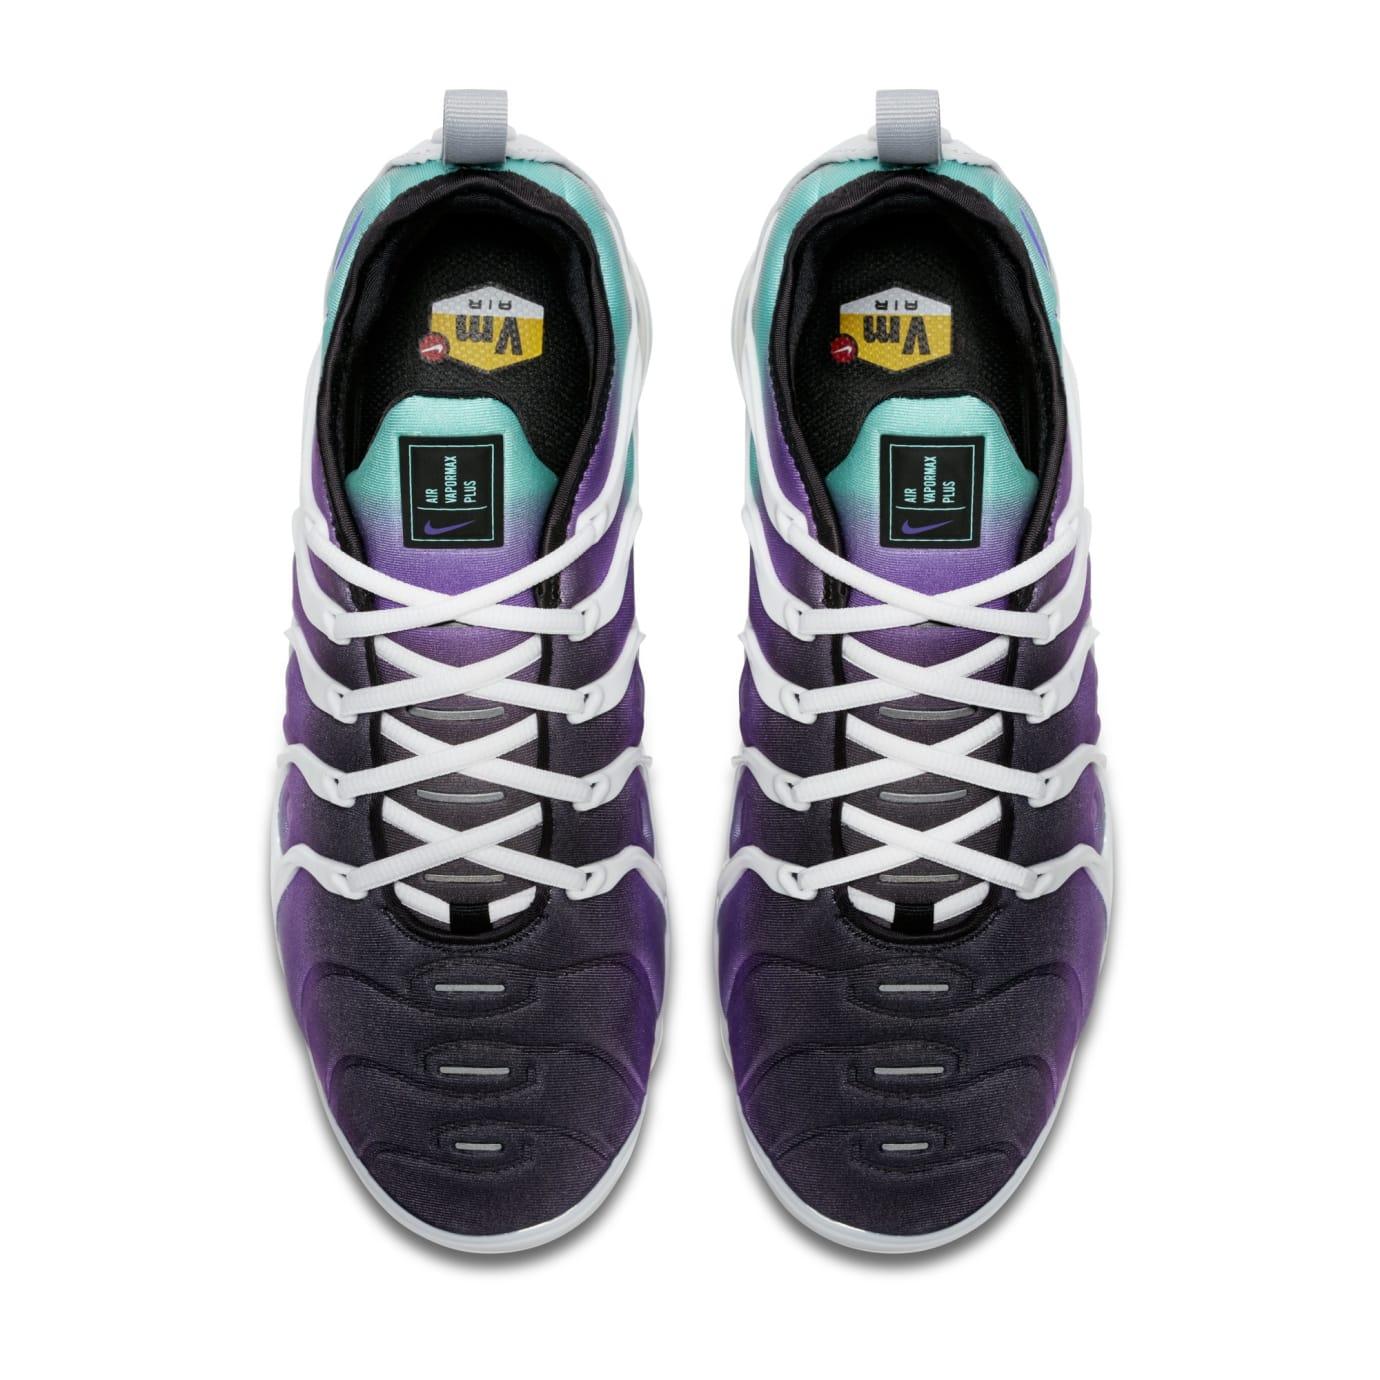 Nike Air VaporMax Plus 'Purple/Aqua' 924453-101 (Top)